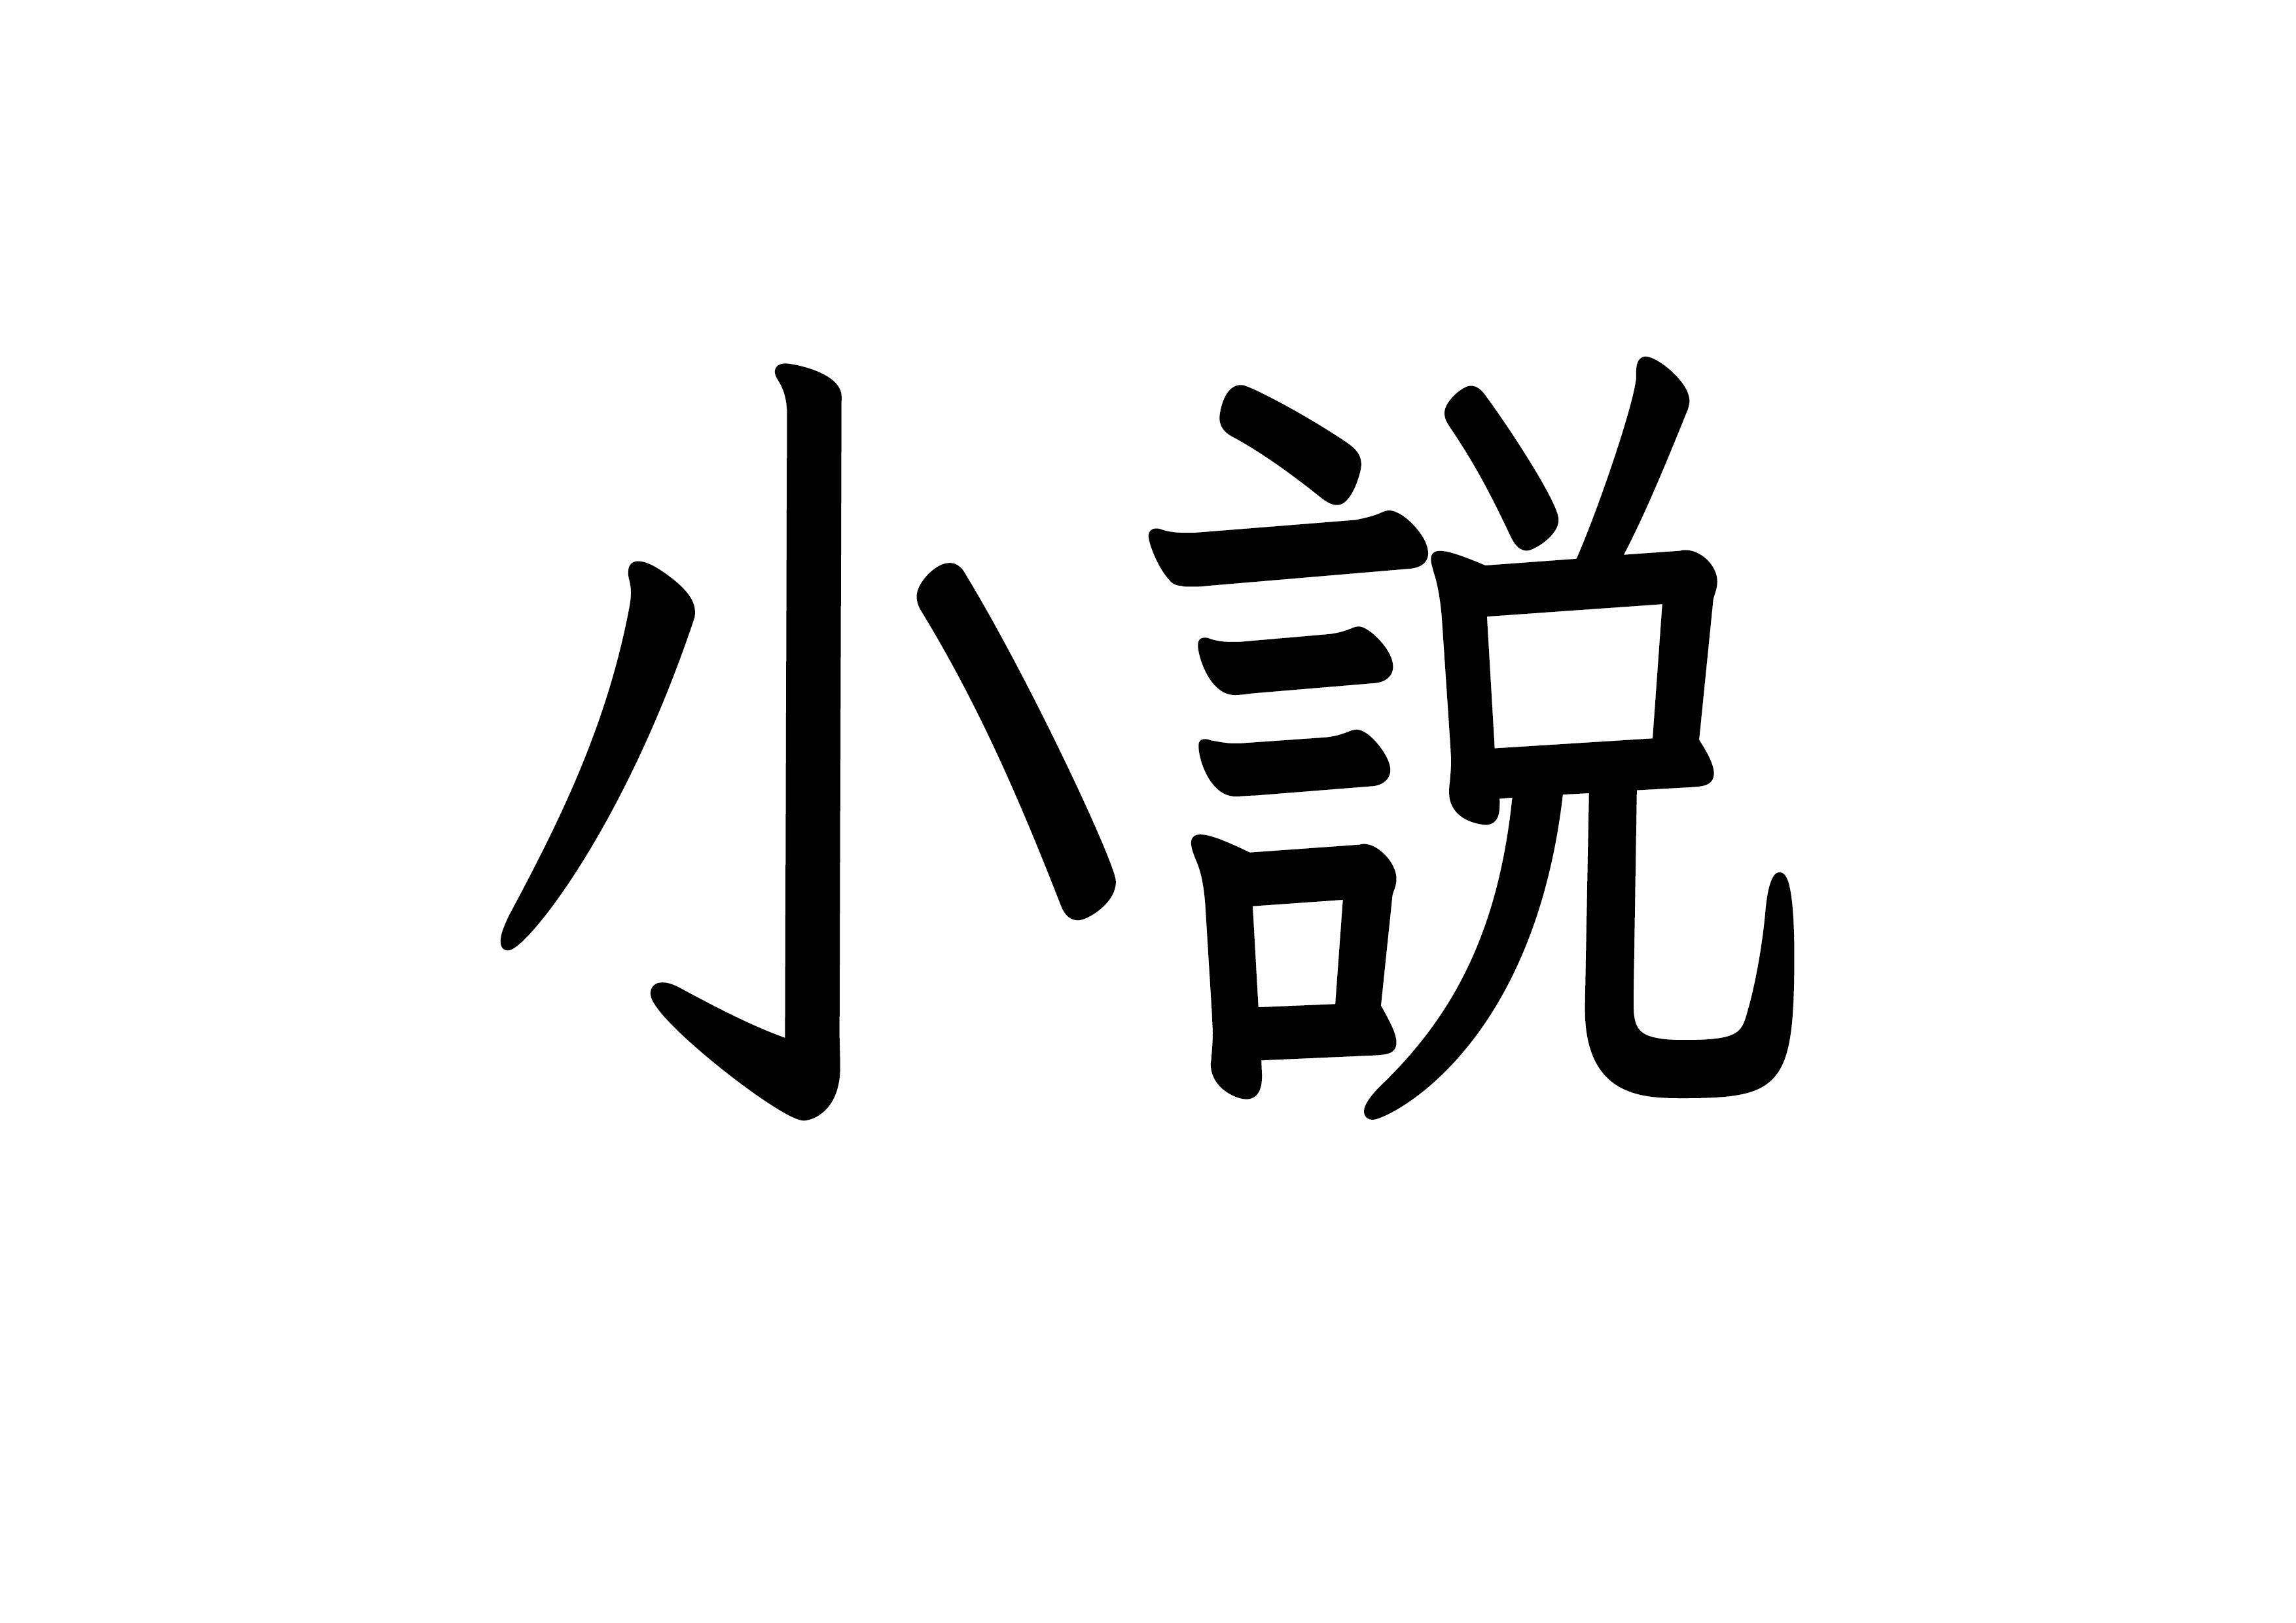 28課文字カード【小説】